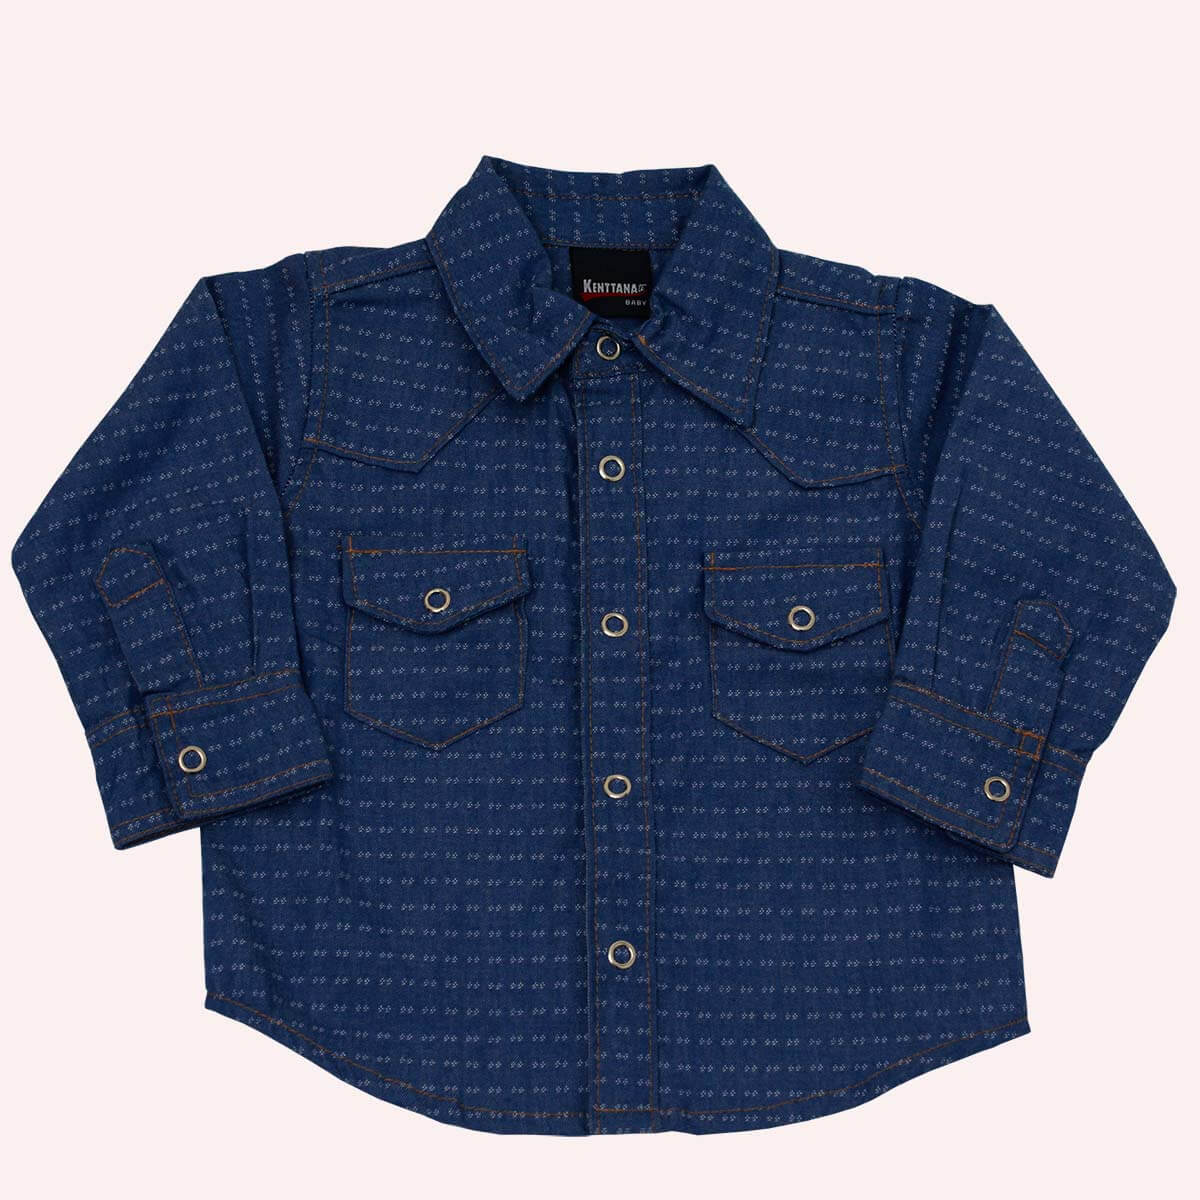 Camisa Kenttana Baby Azul Marinho